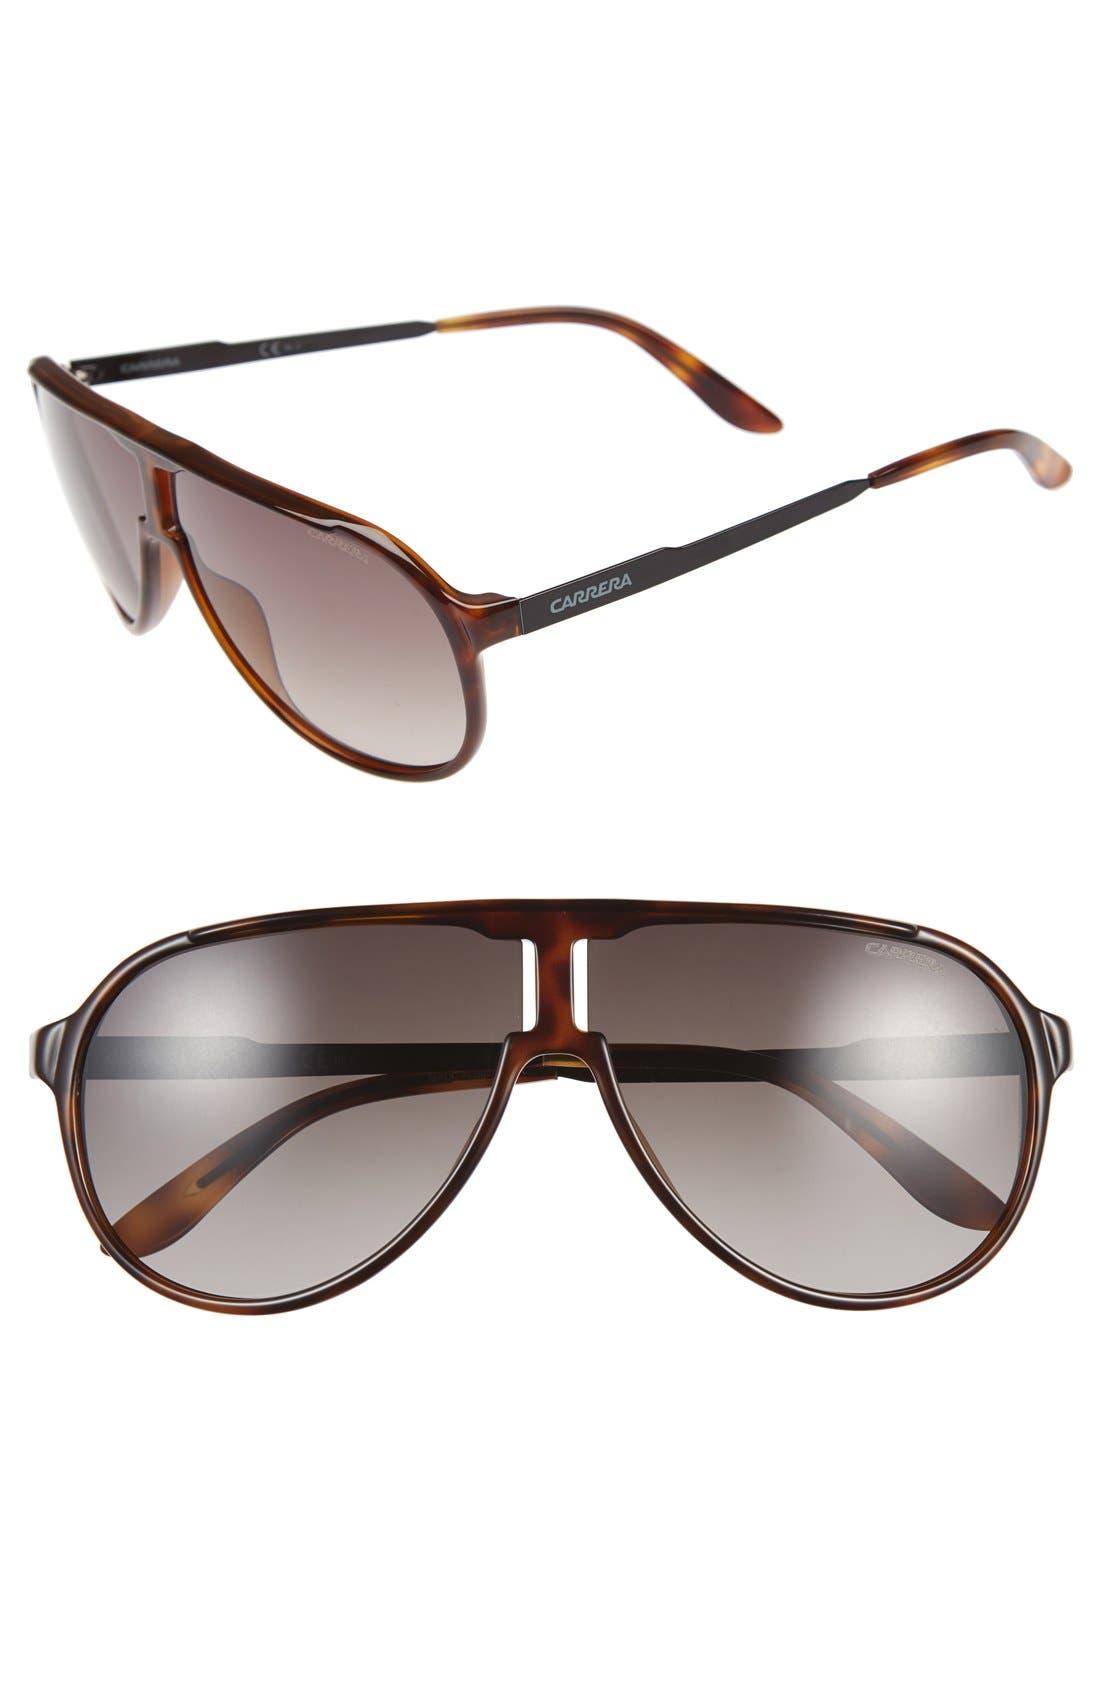 62mm Aviator Sunglasses,                         Main,                         color, Havana Black/ Brown Gradient